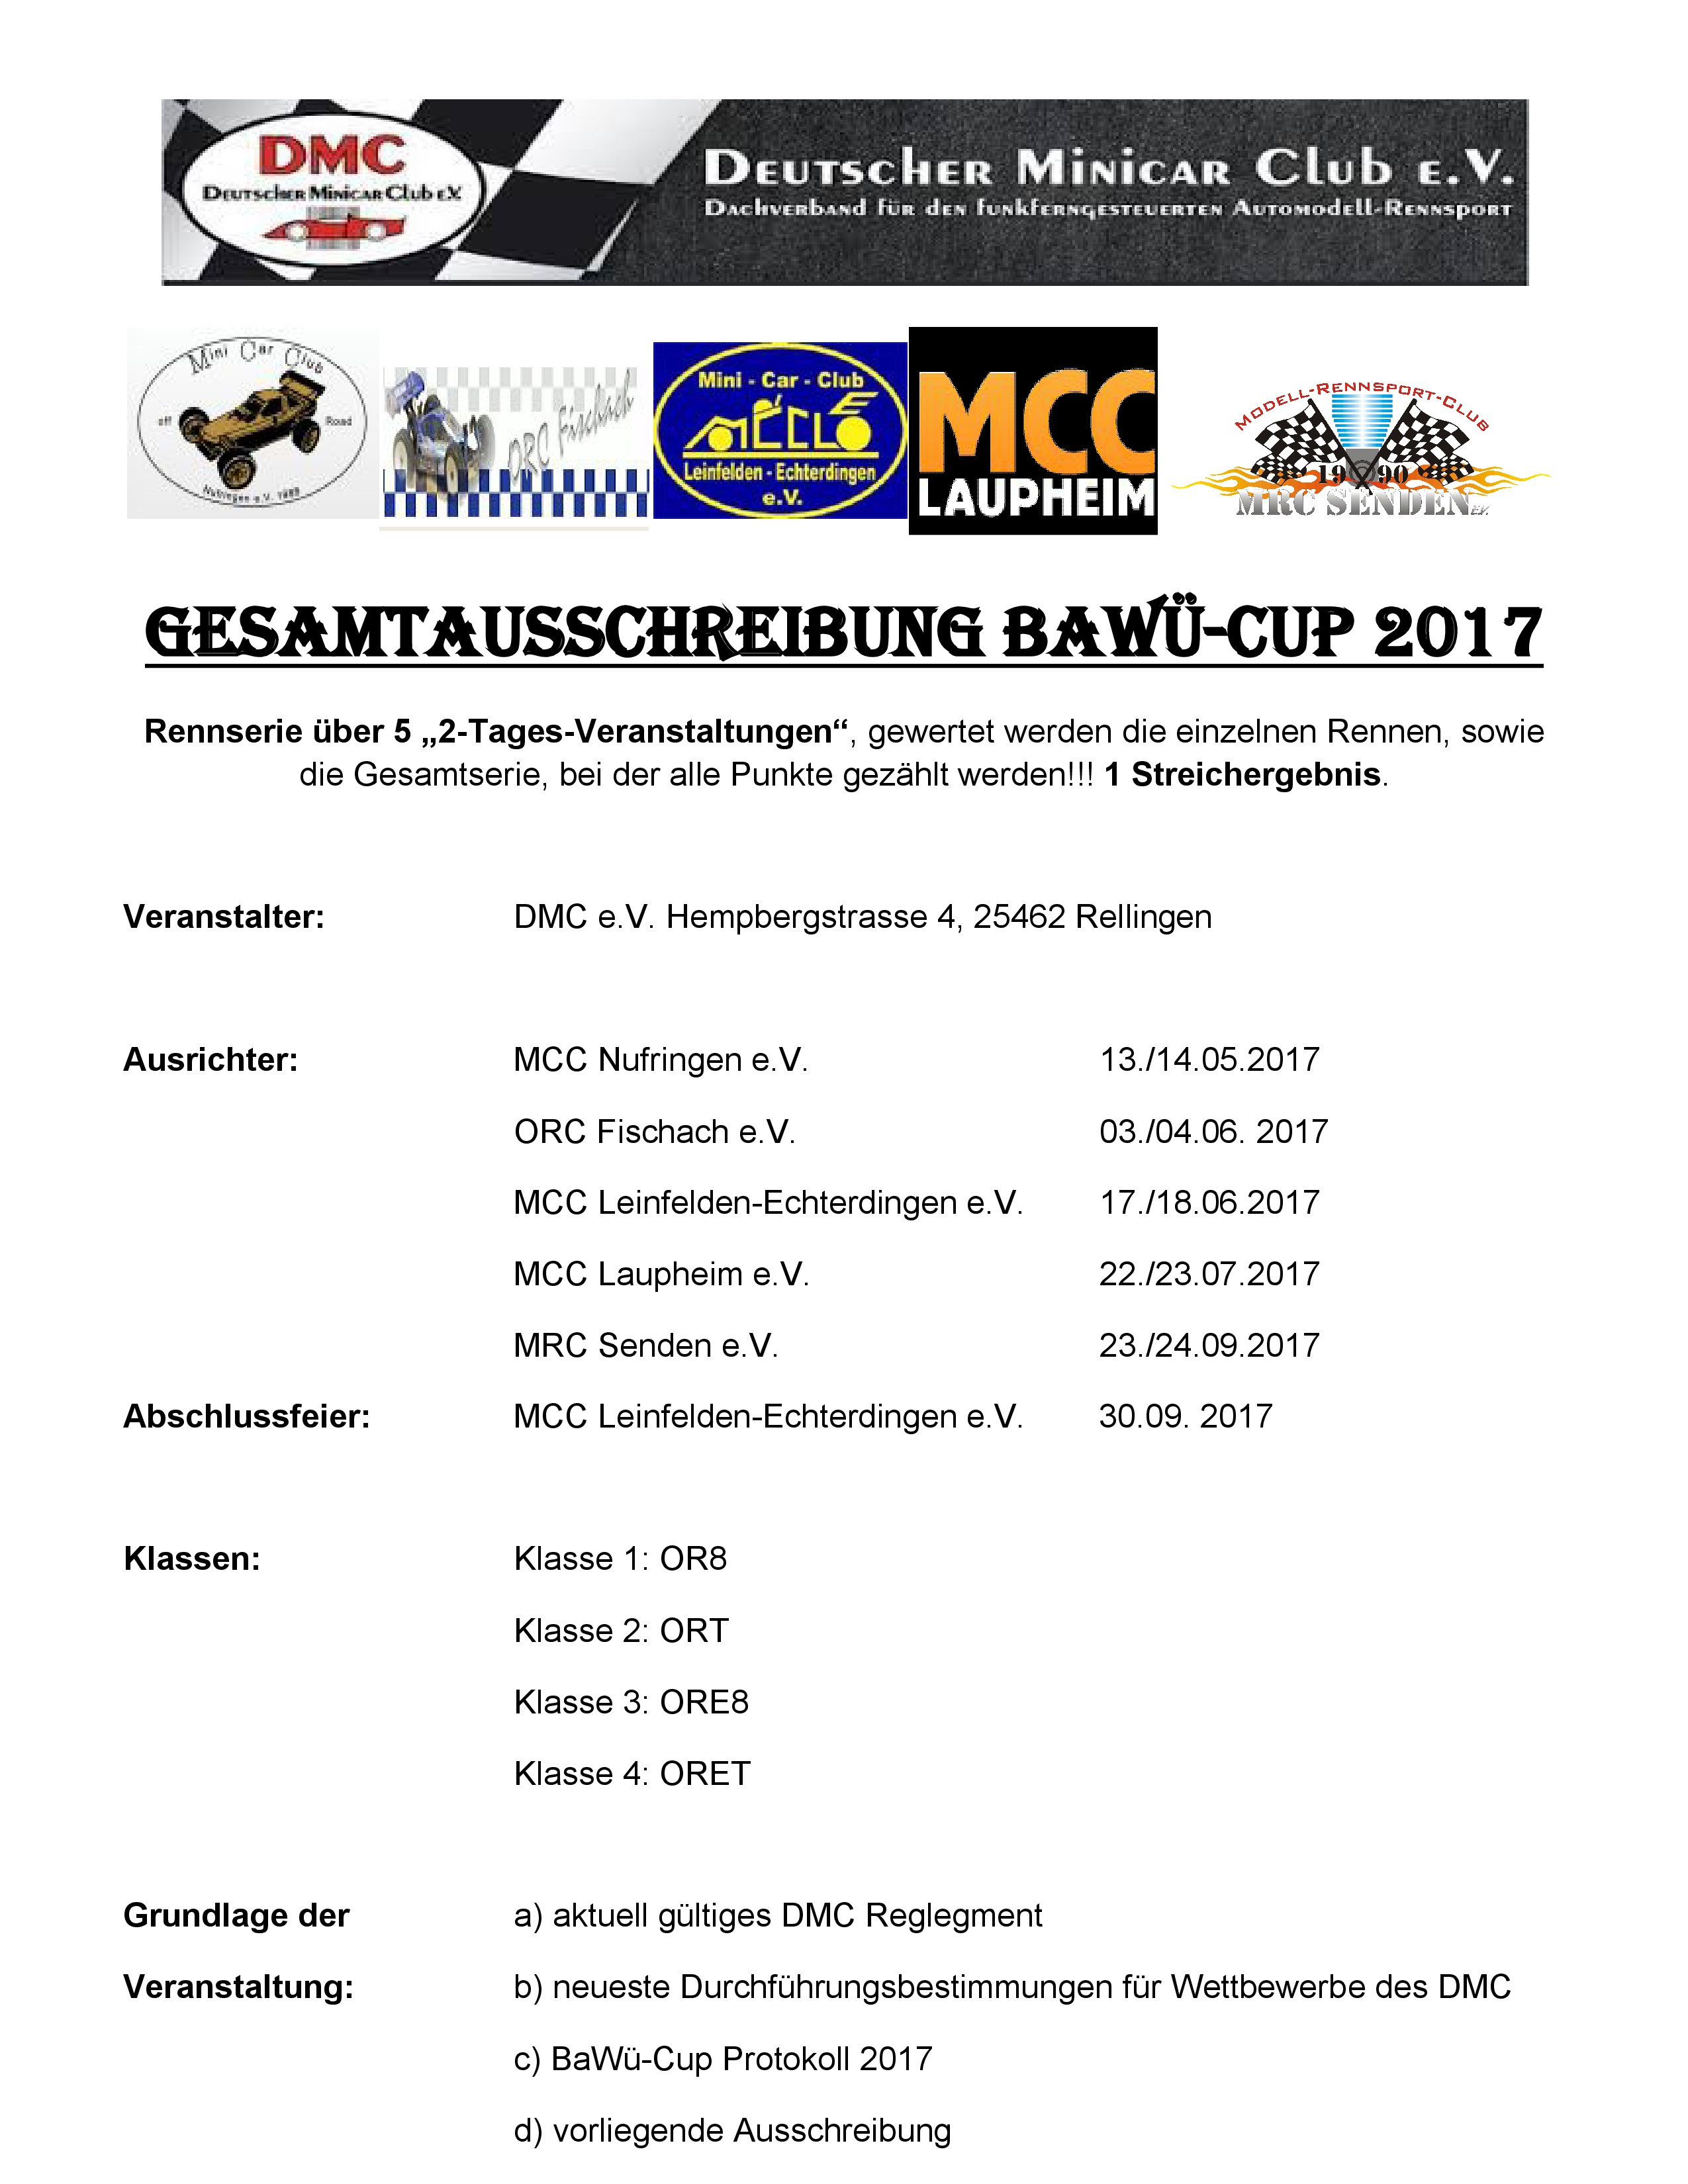 Gesamtausschreibung BaWu 2017-001